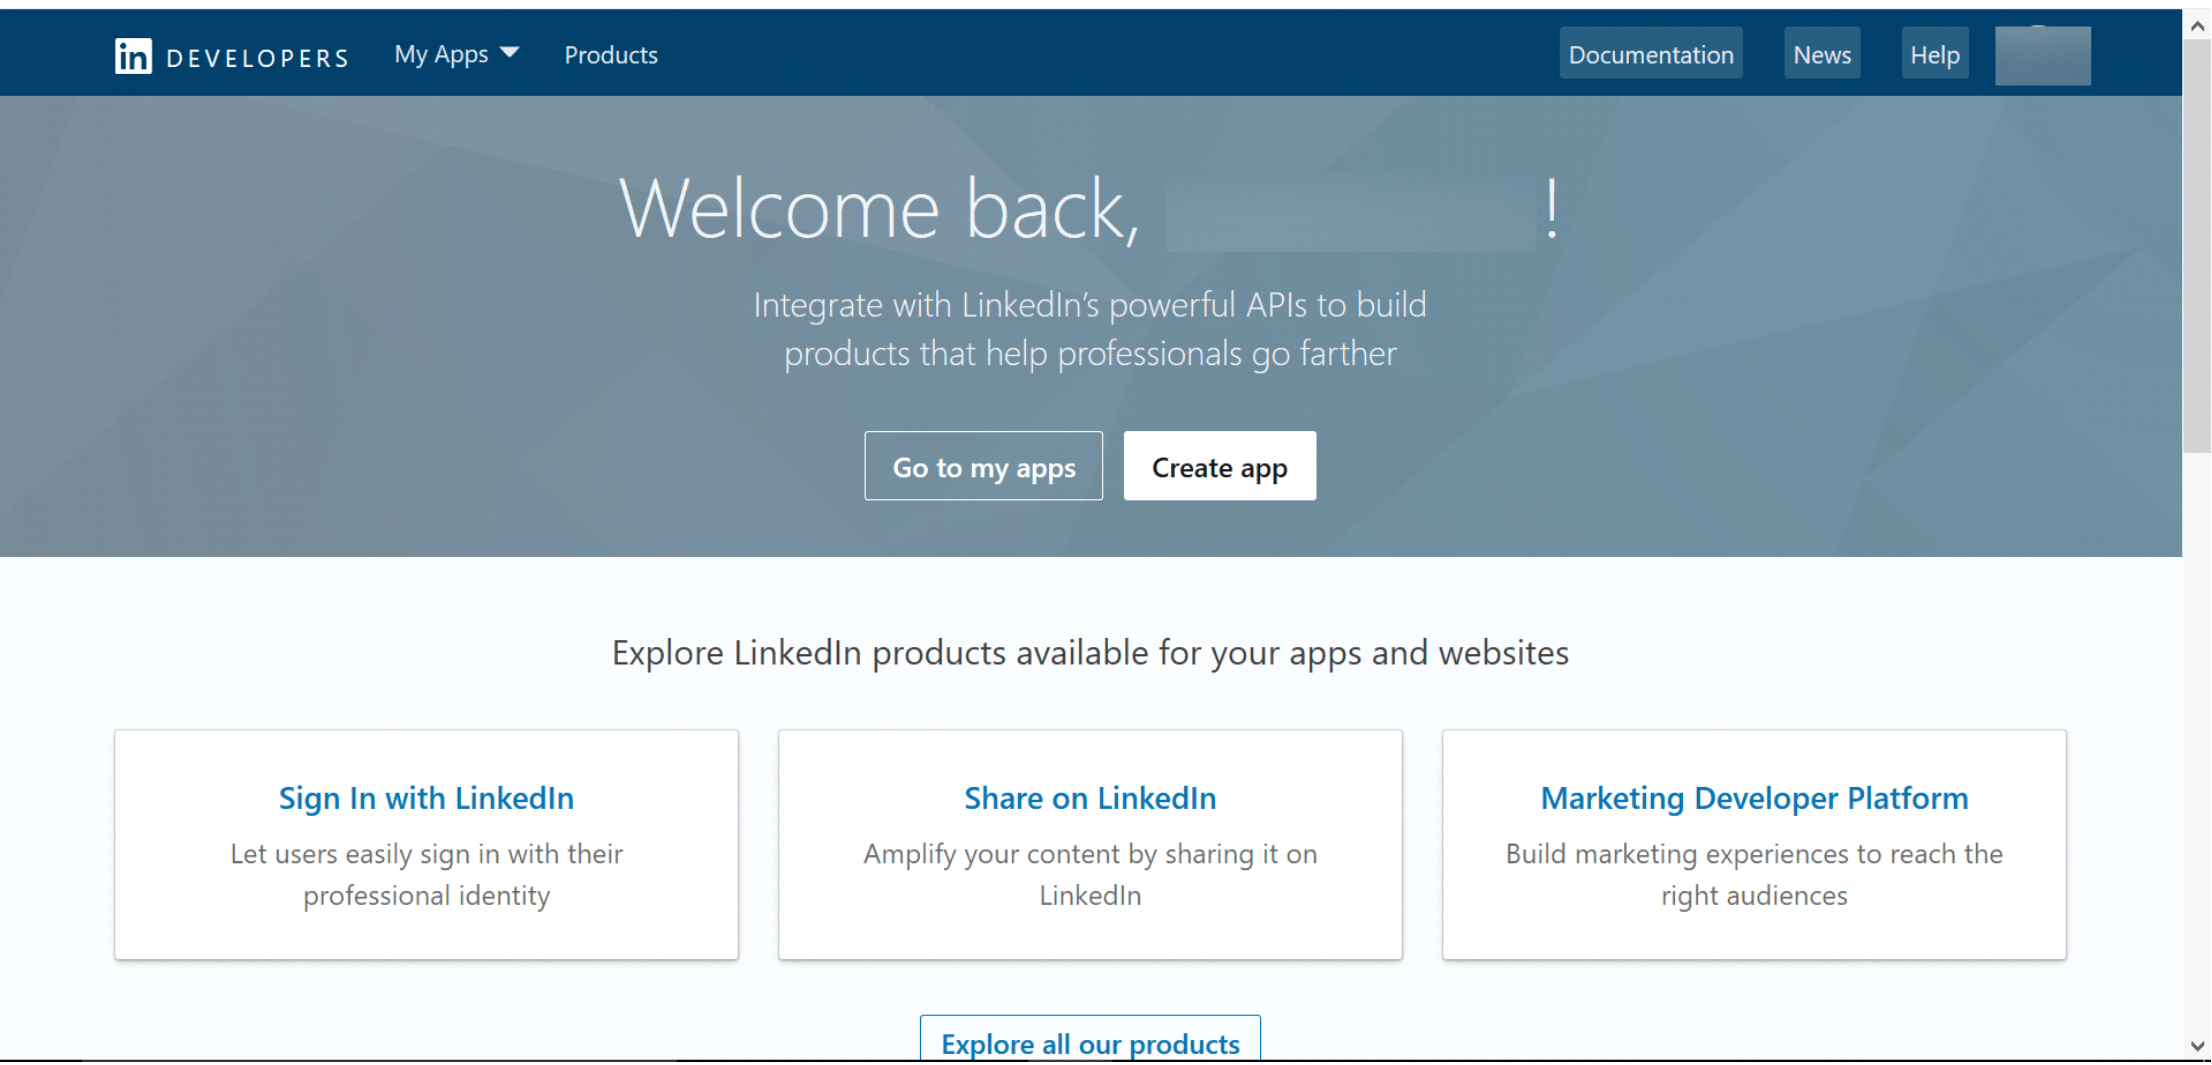 setup miniOrange as broker service with LinkedIn using oauth